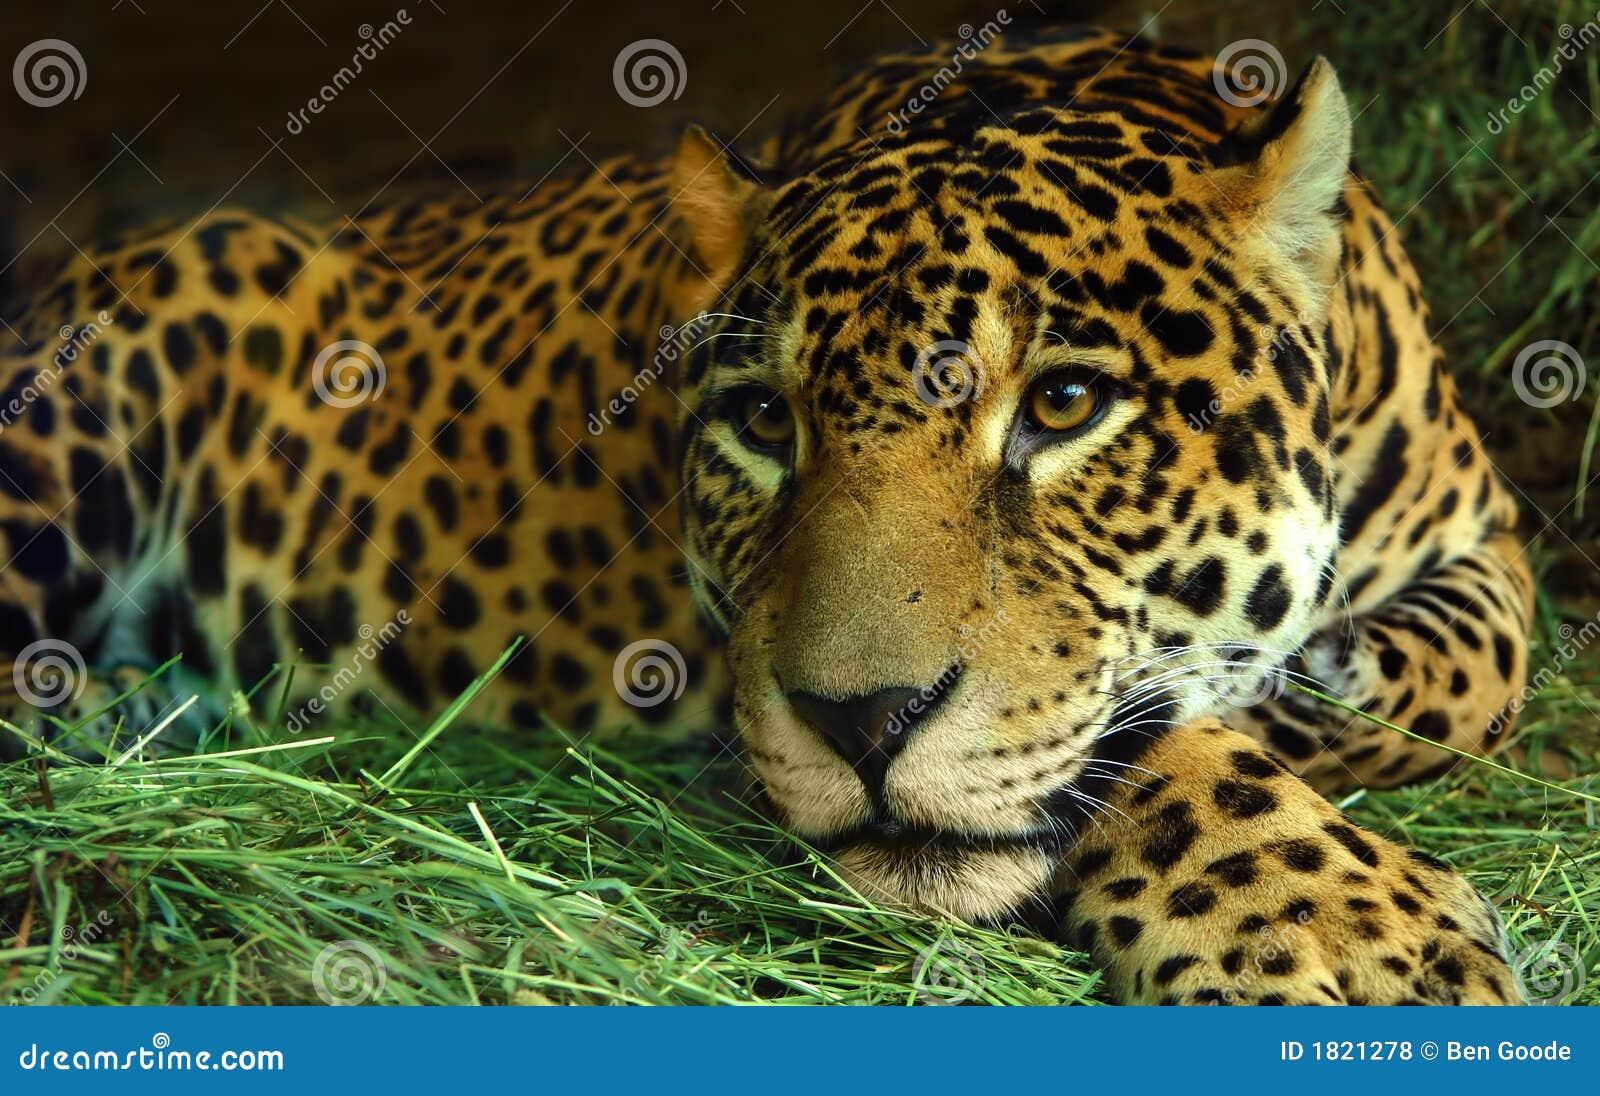 eye of the jaguar stock photo image of eyes african 1821278. Black Bedroom Furniture Sets. Home Design Ideas